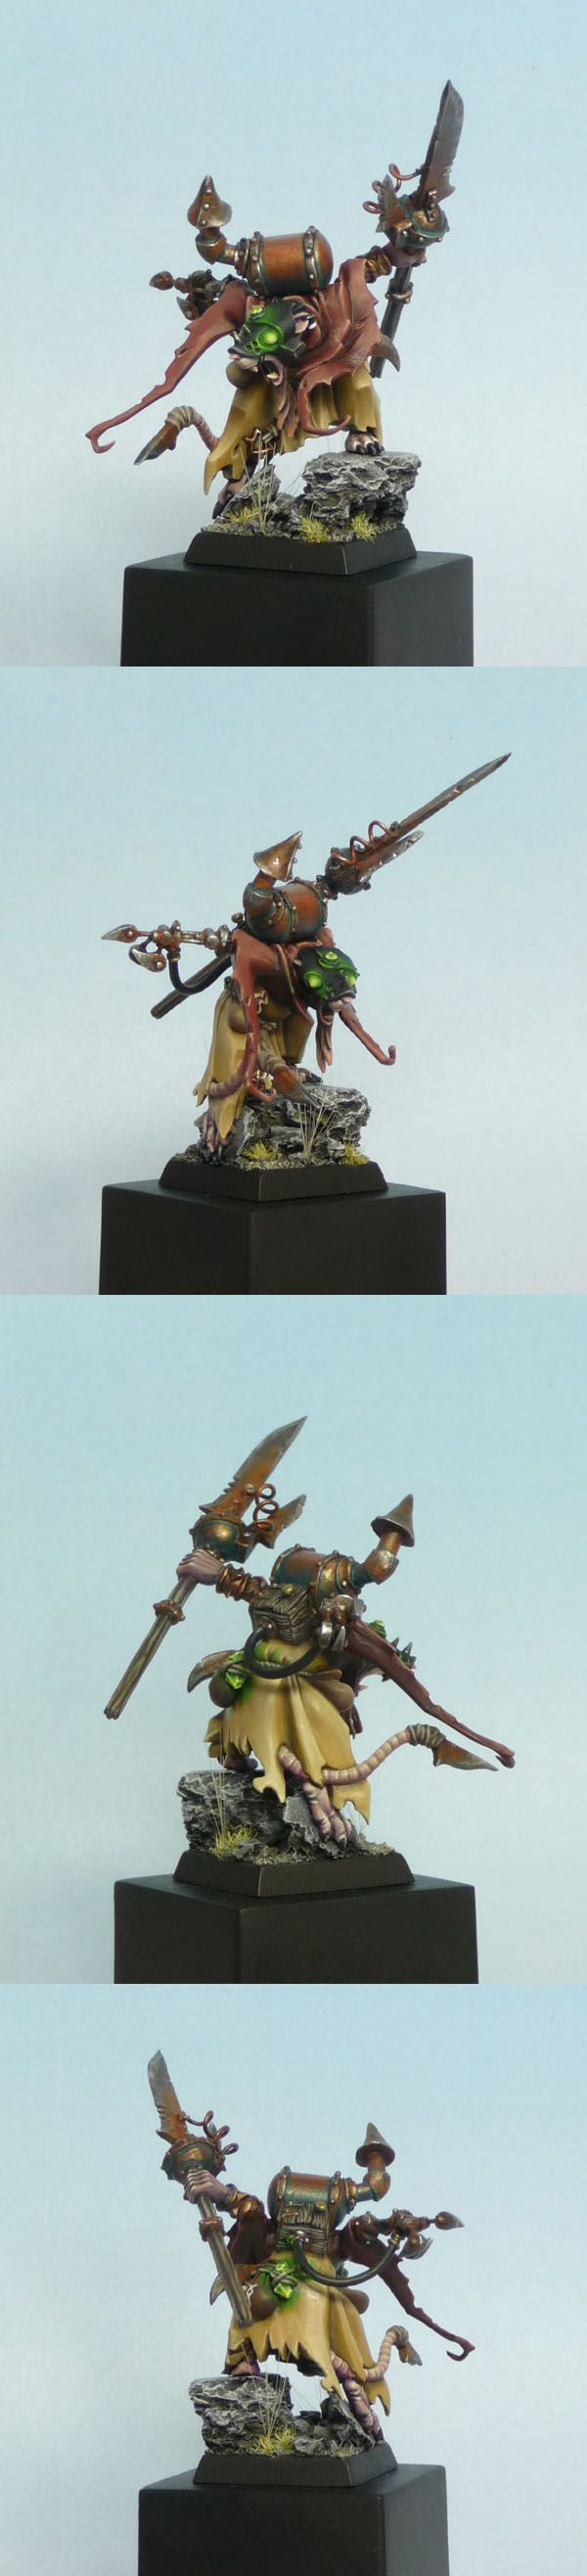 Skaven Warlock conversion.